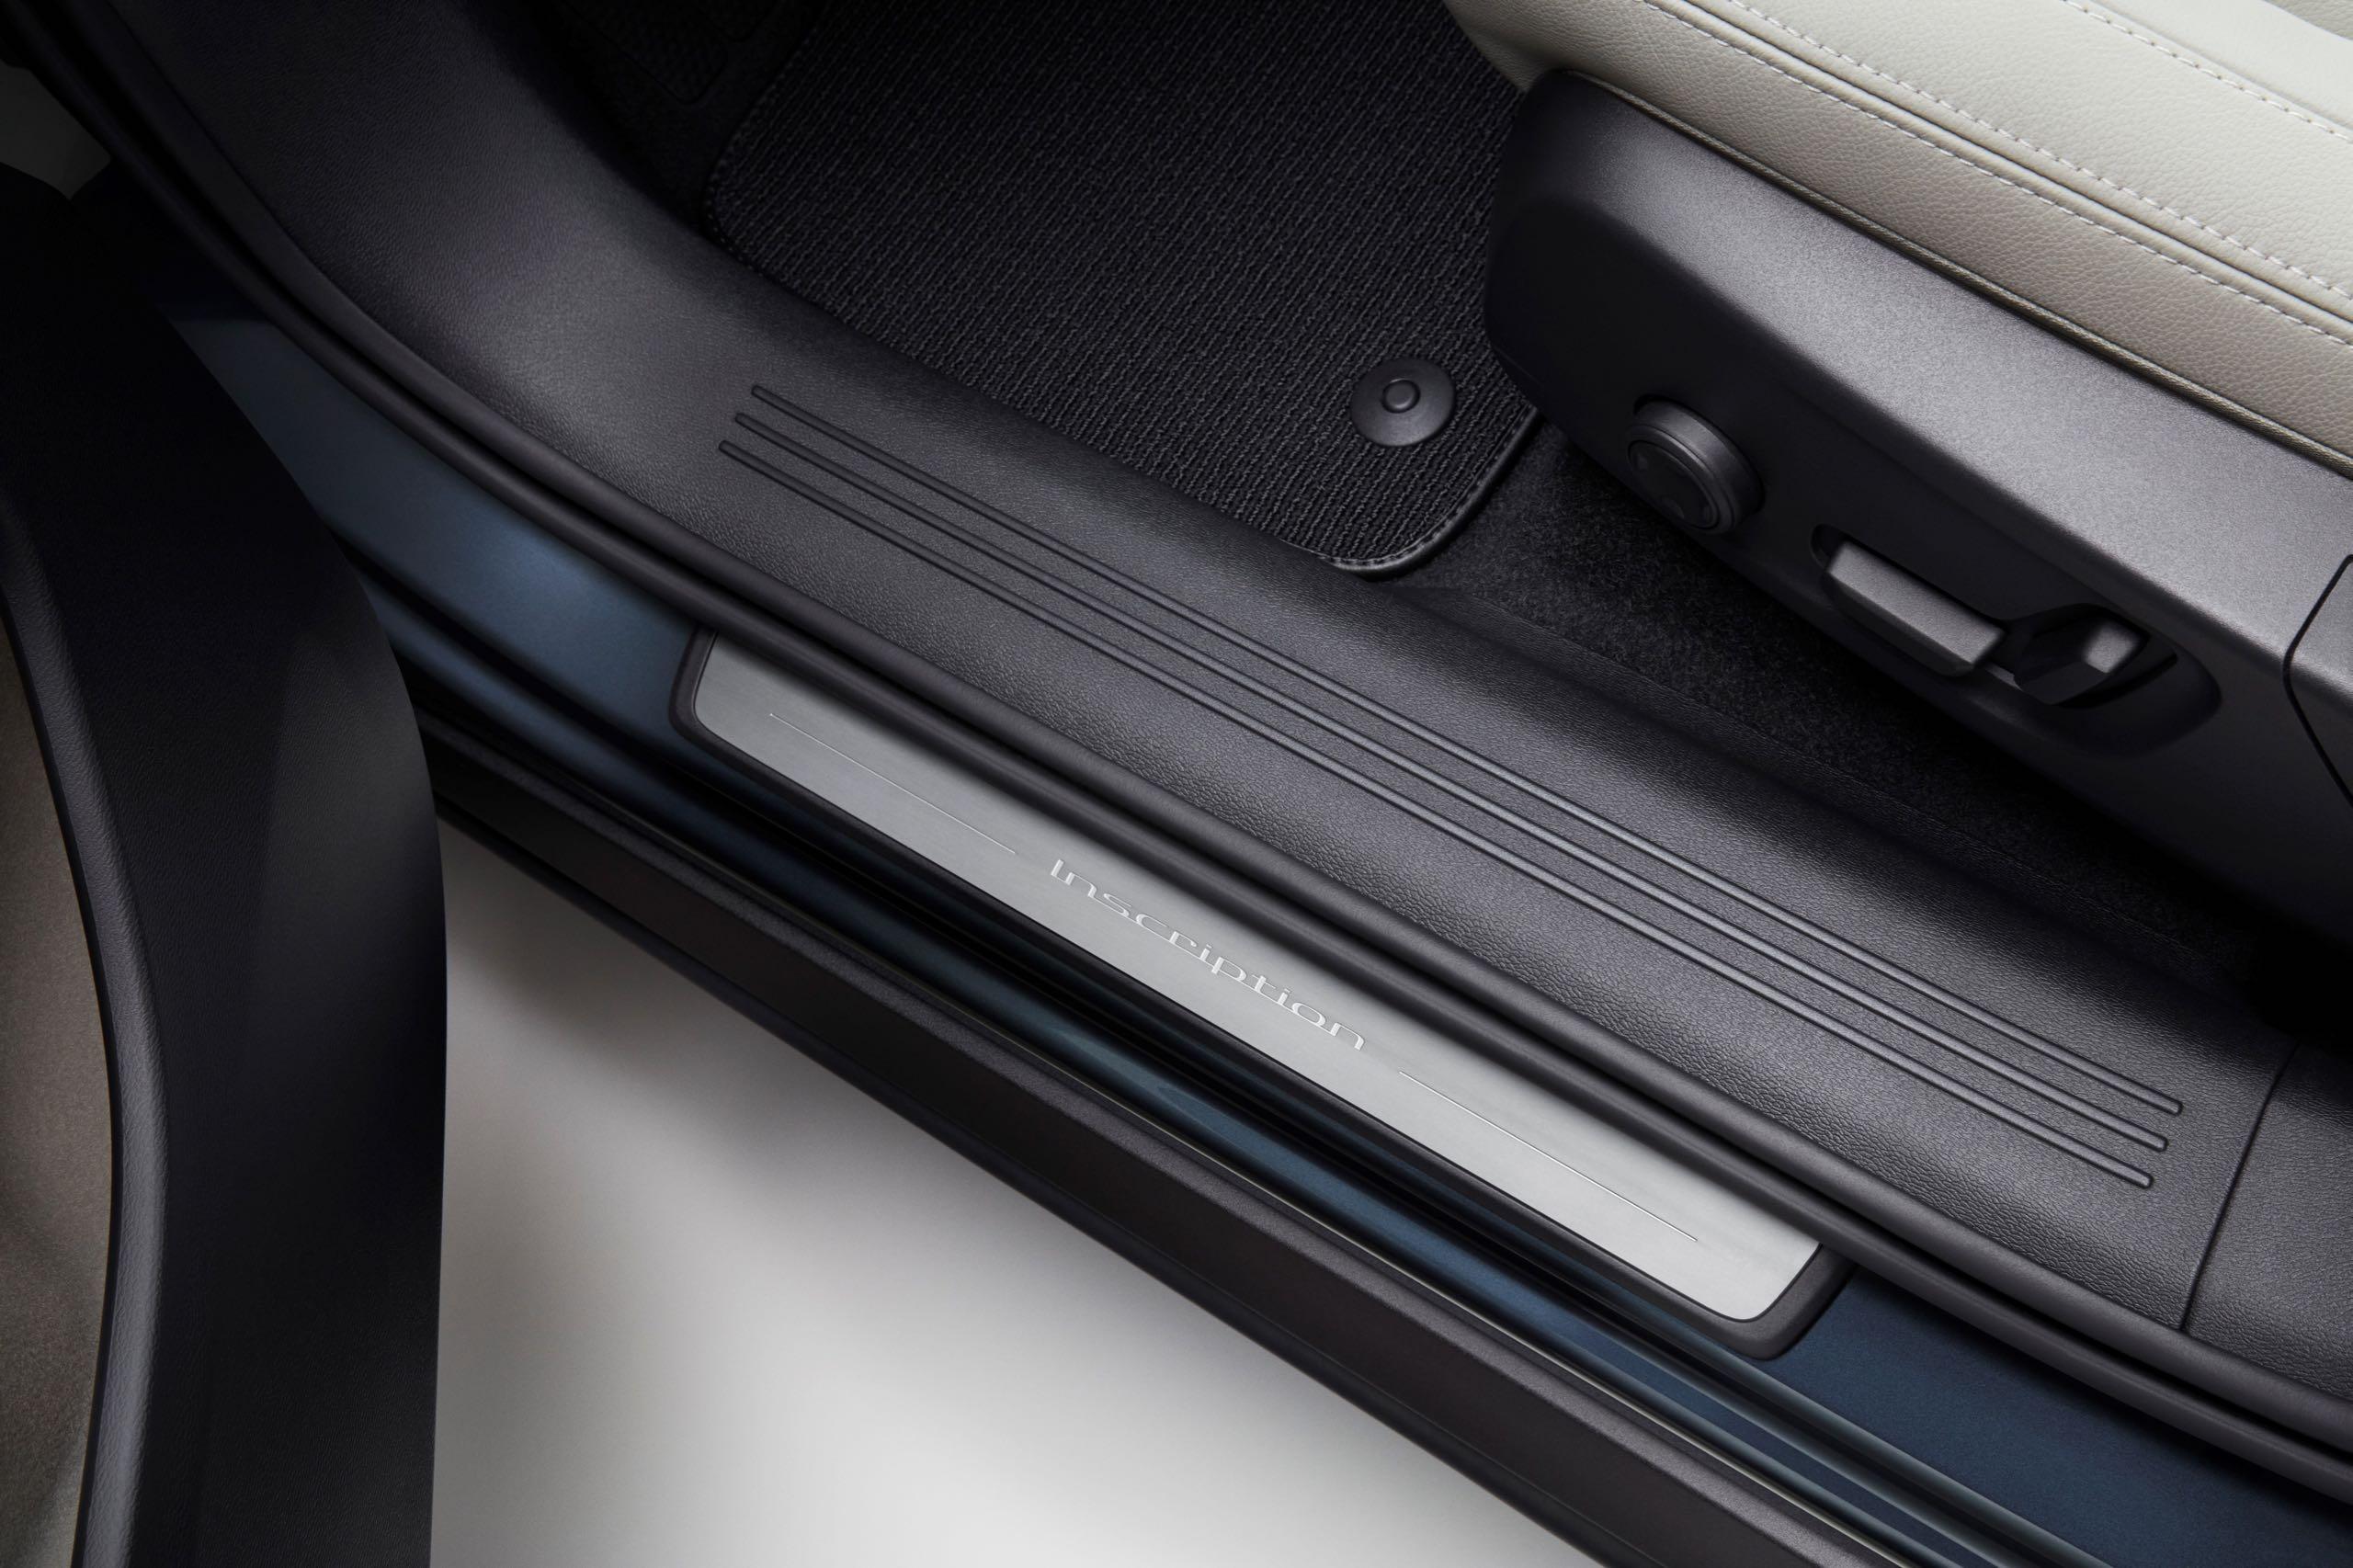 New Volvo XC40 Inscription Interior Detail -  2018, 2018 New XC40, Design, Exterior, Images, New XC40, Studio